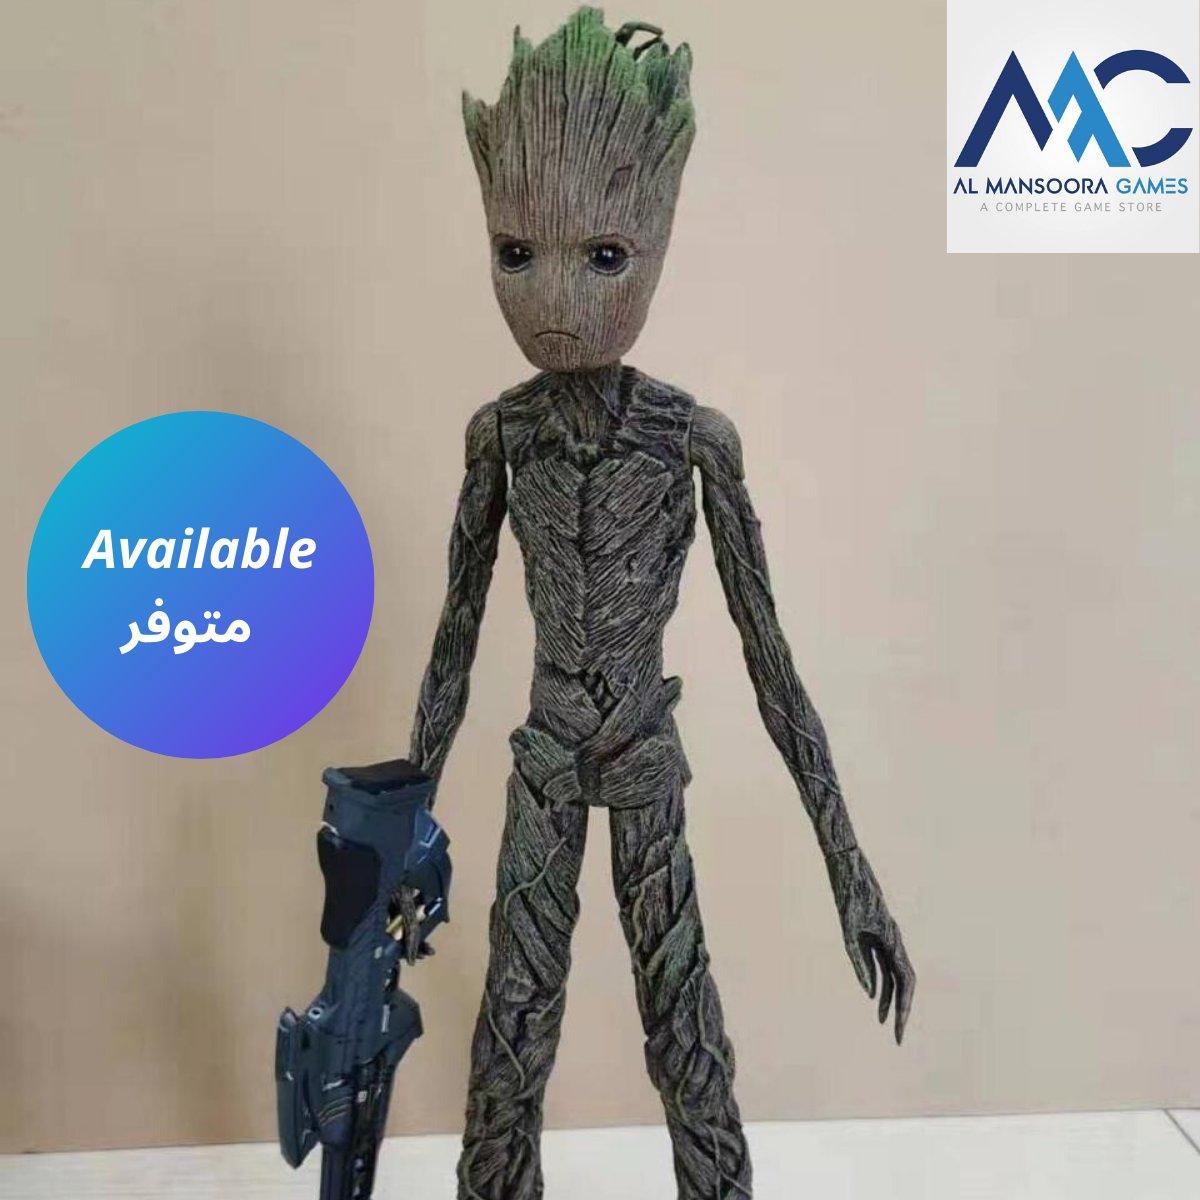 Available in Almansoora shop (Groot) character (متوفر في المحل المنصورة شخصية (غروت 👽🌱🍀🌳🌴 #PS4 #xboxone #Groot #galaxy guardians #character  #doll #game #games #adventure #Review #fortnite  #action #amazing #pc #callofduty  #gaming #gtav #marvel #memes #comics #cool